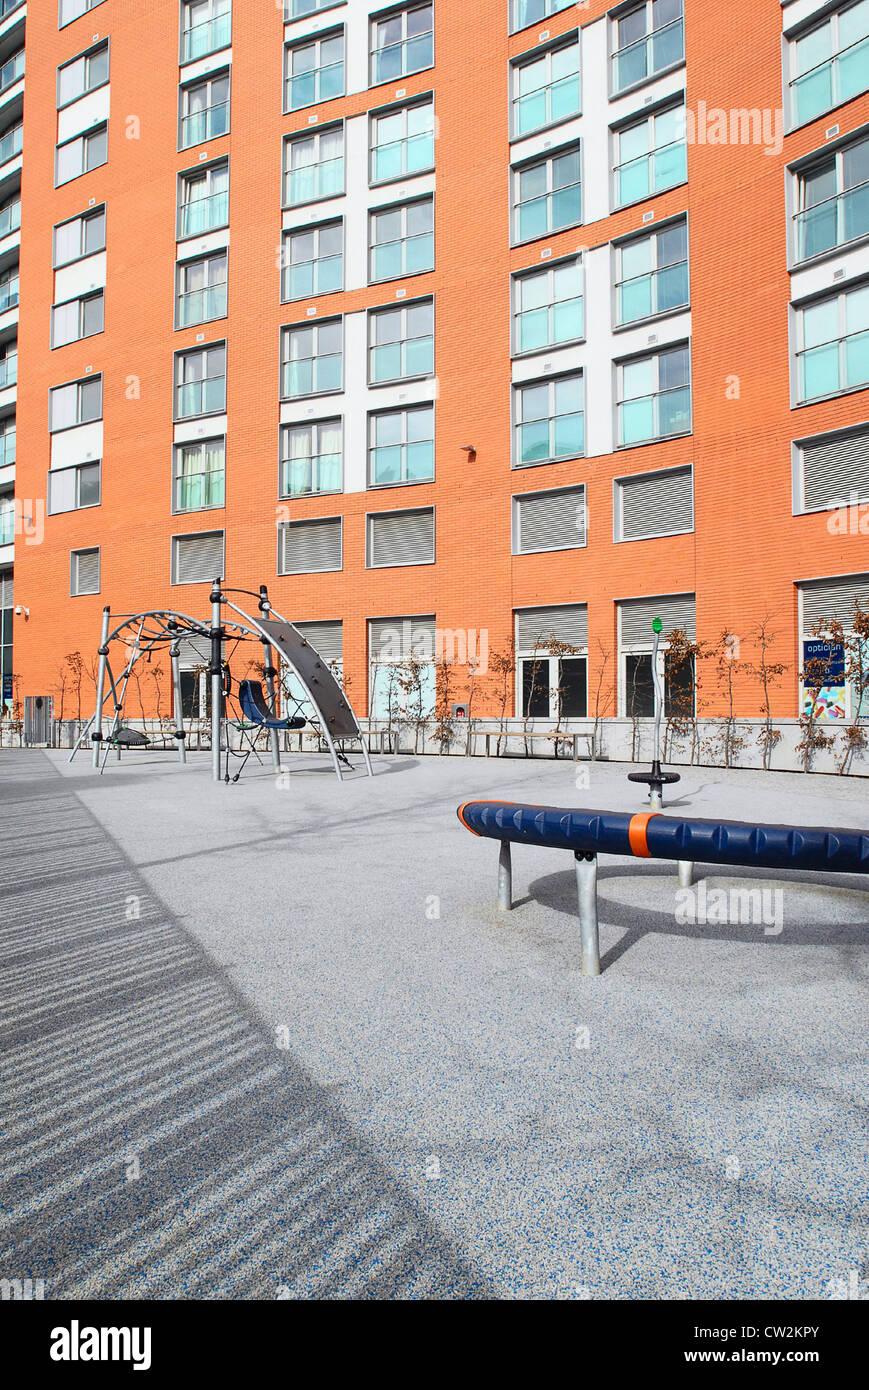 Hard landscaping in new housing development London. - Stock Image